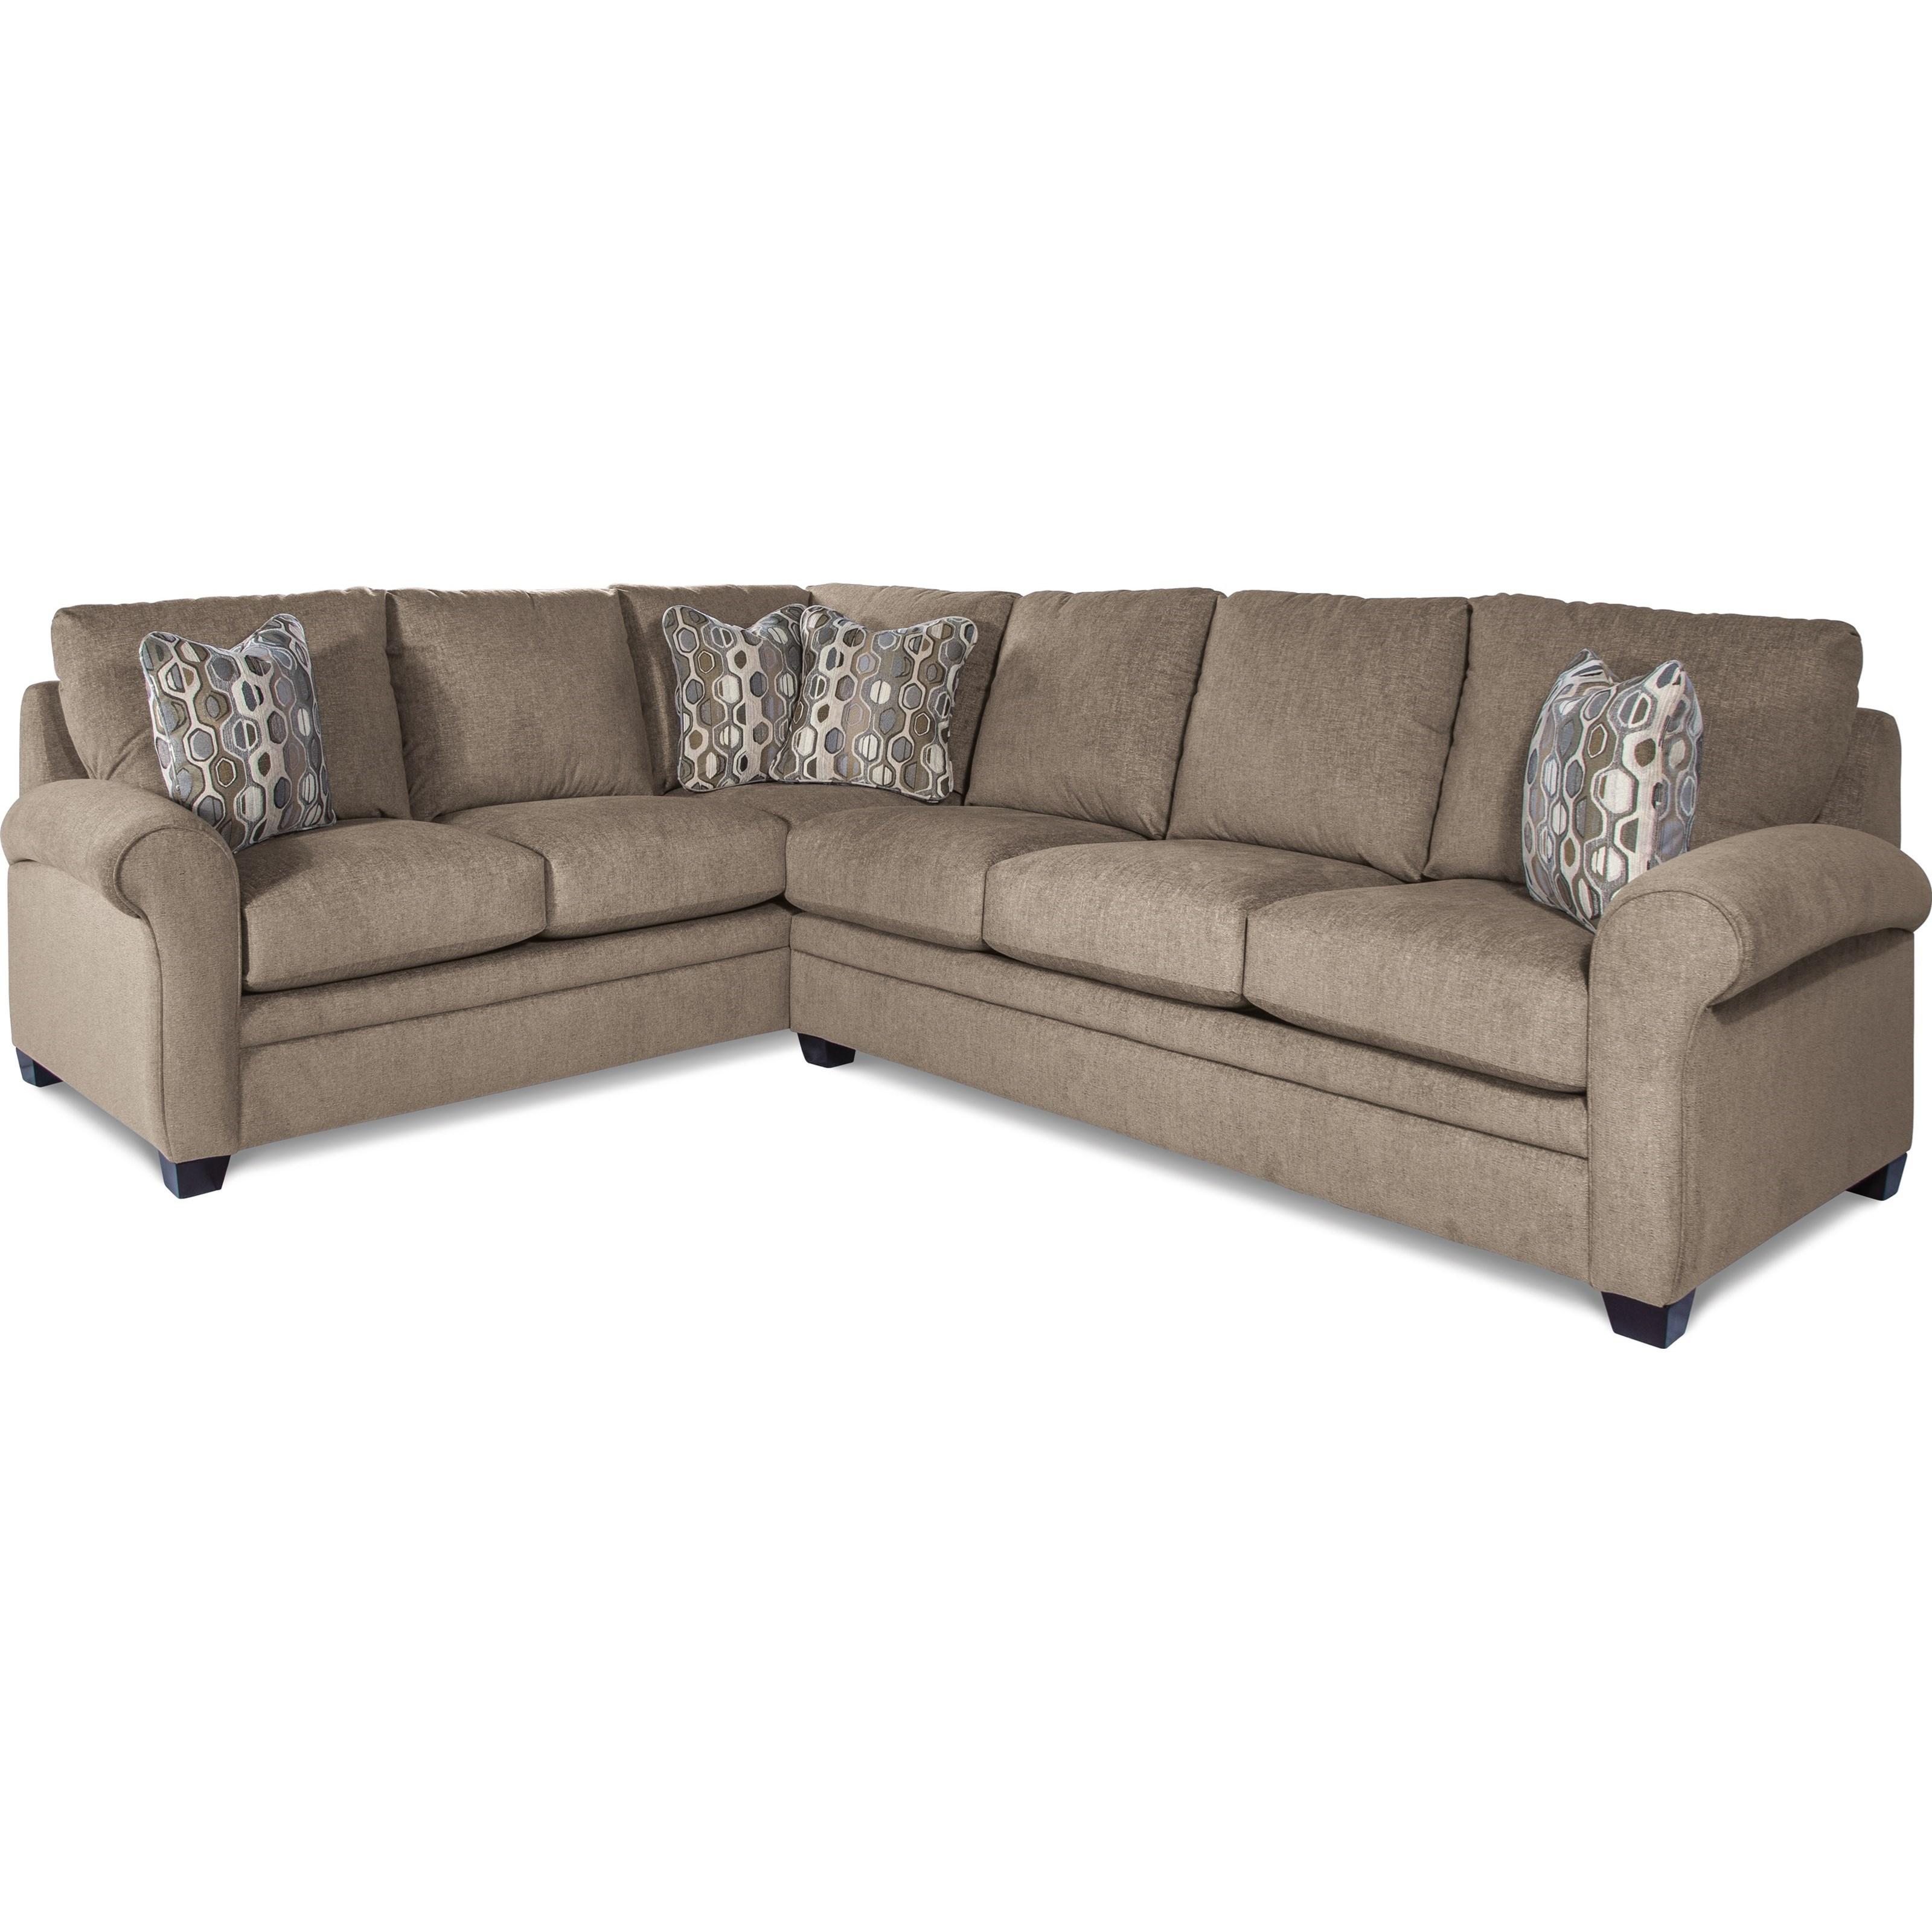 Genial La Z Boy Natalie2 Pc Sectional Sofa W/ Queen Sleeper Mattres ...